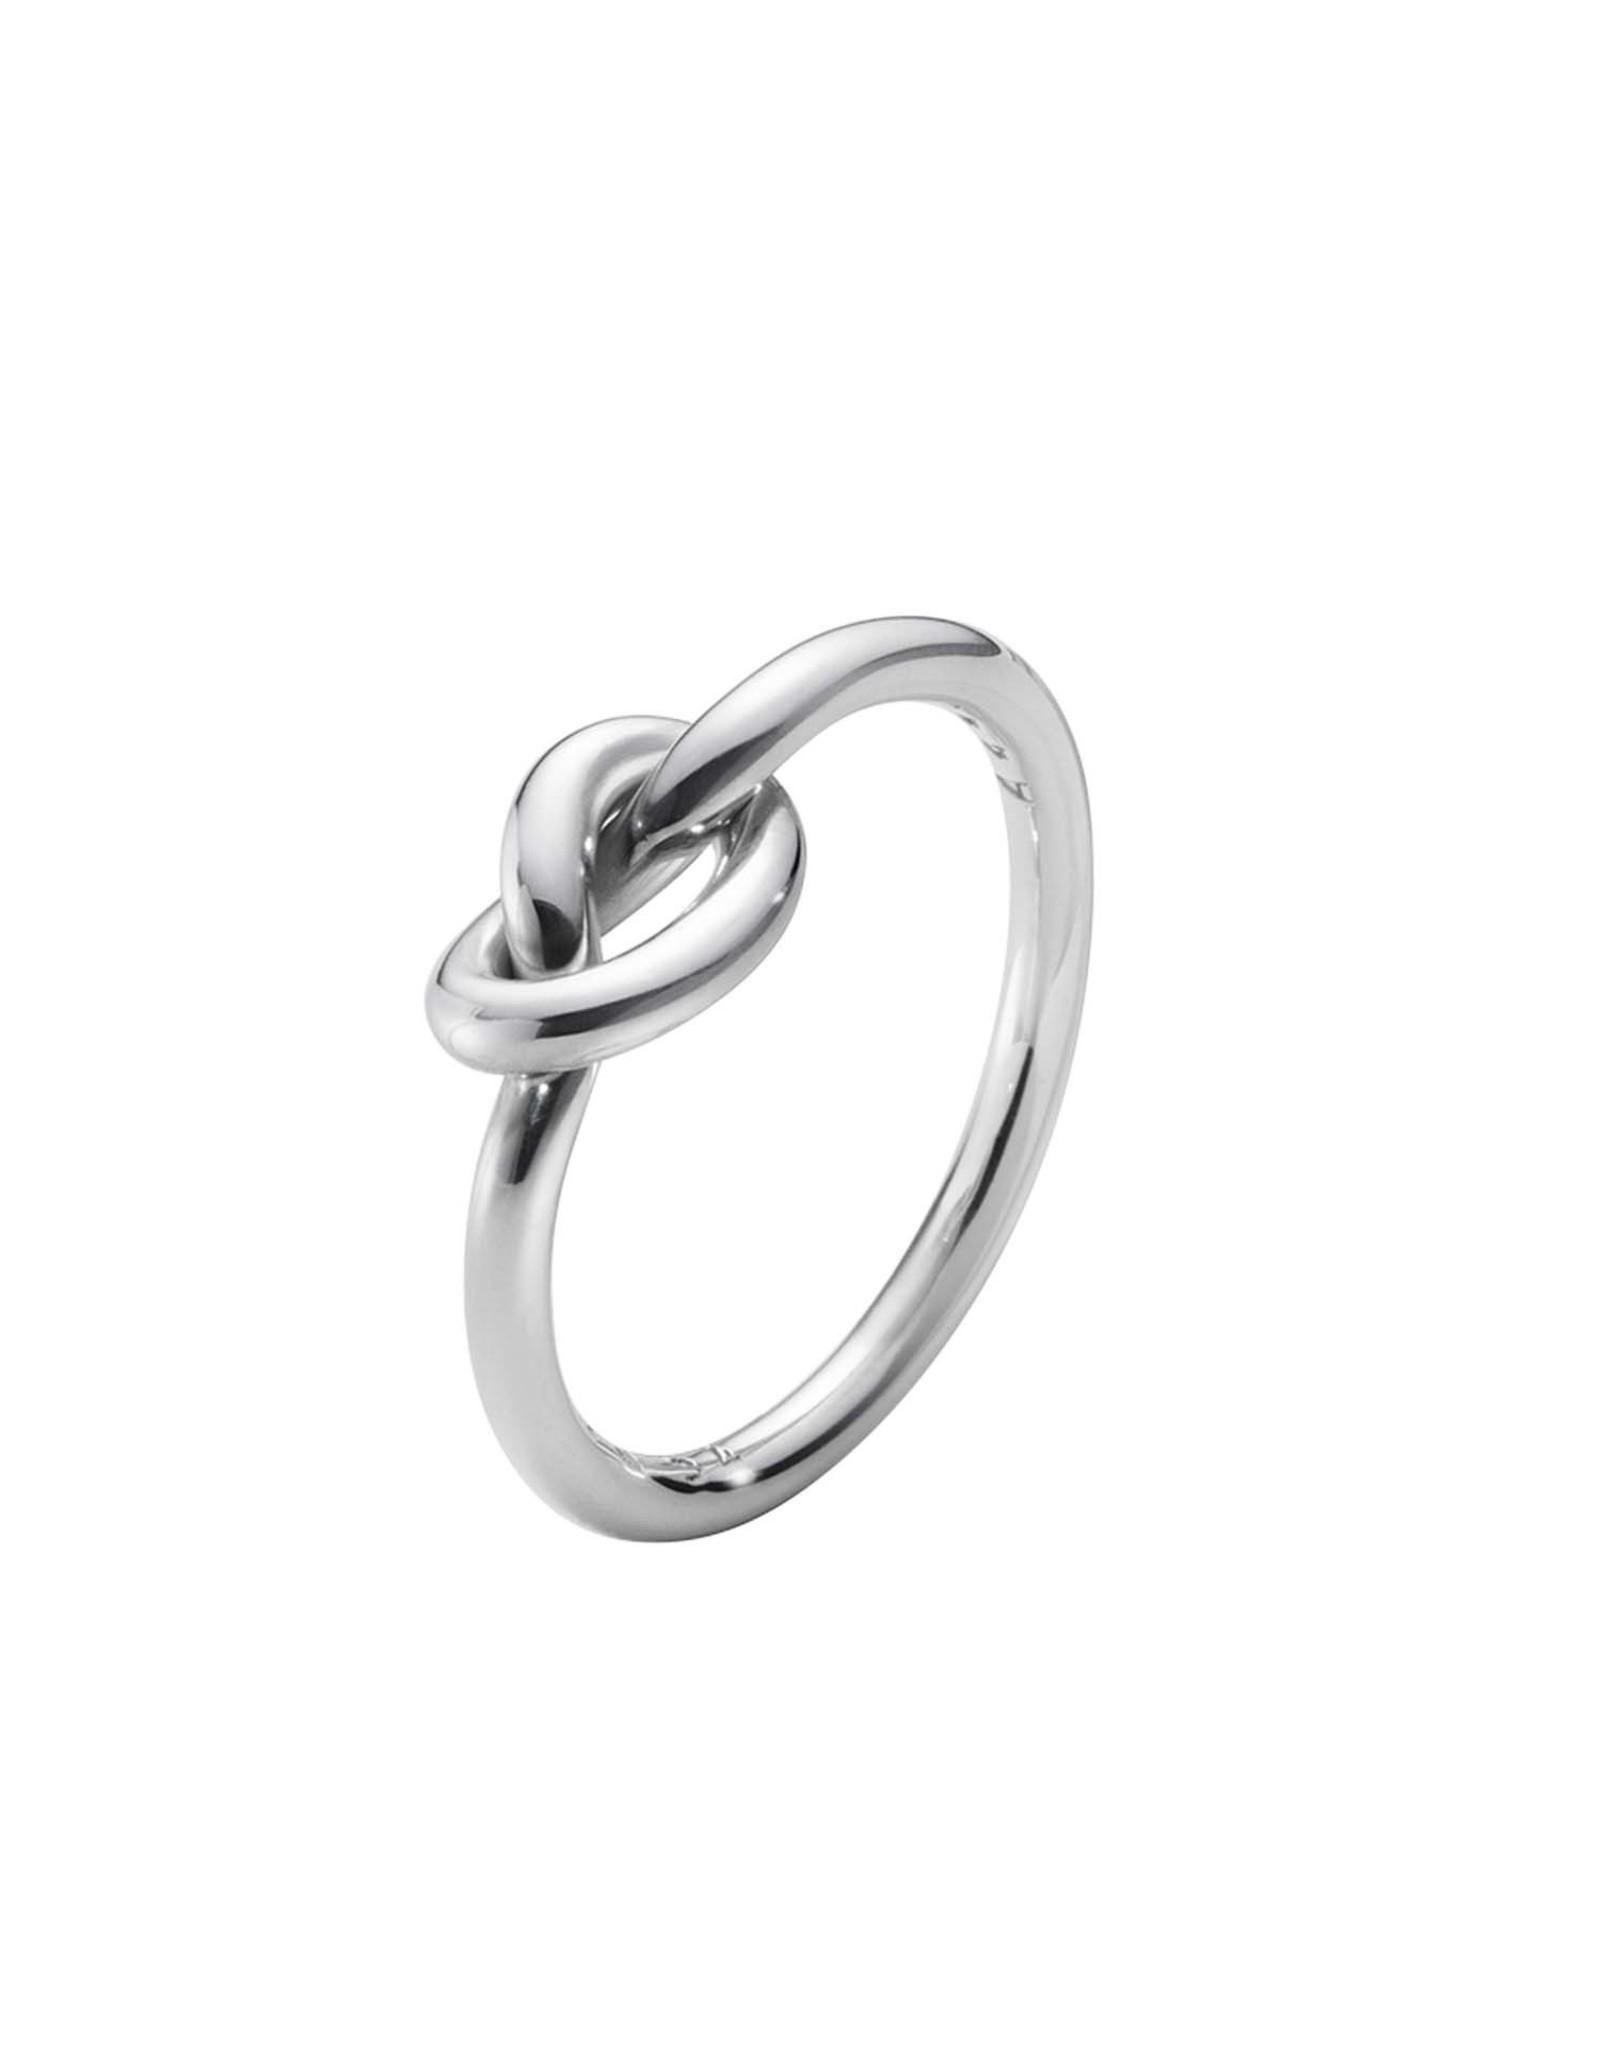 Georg Jensen Love Knot Ring, Size 6